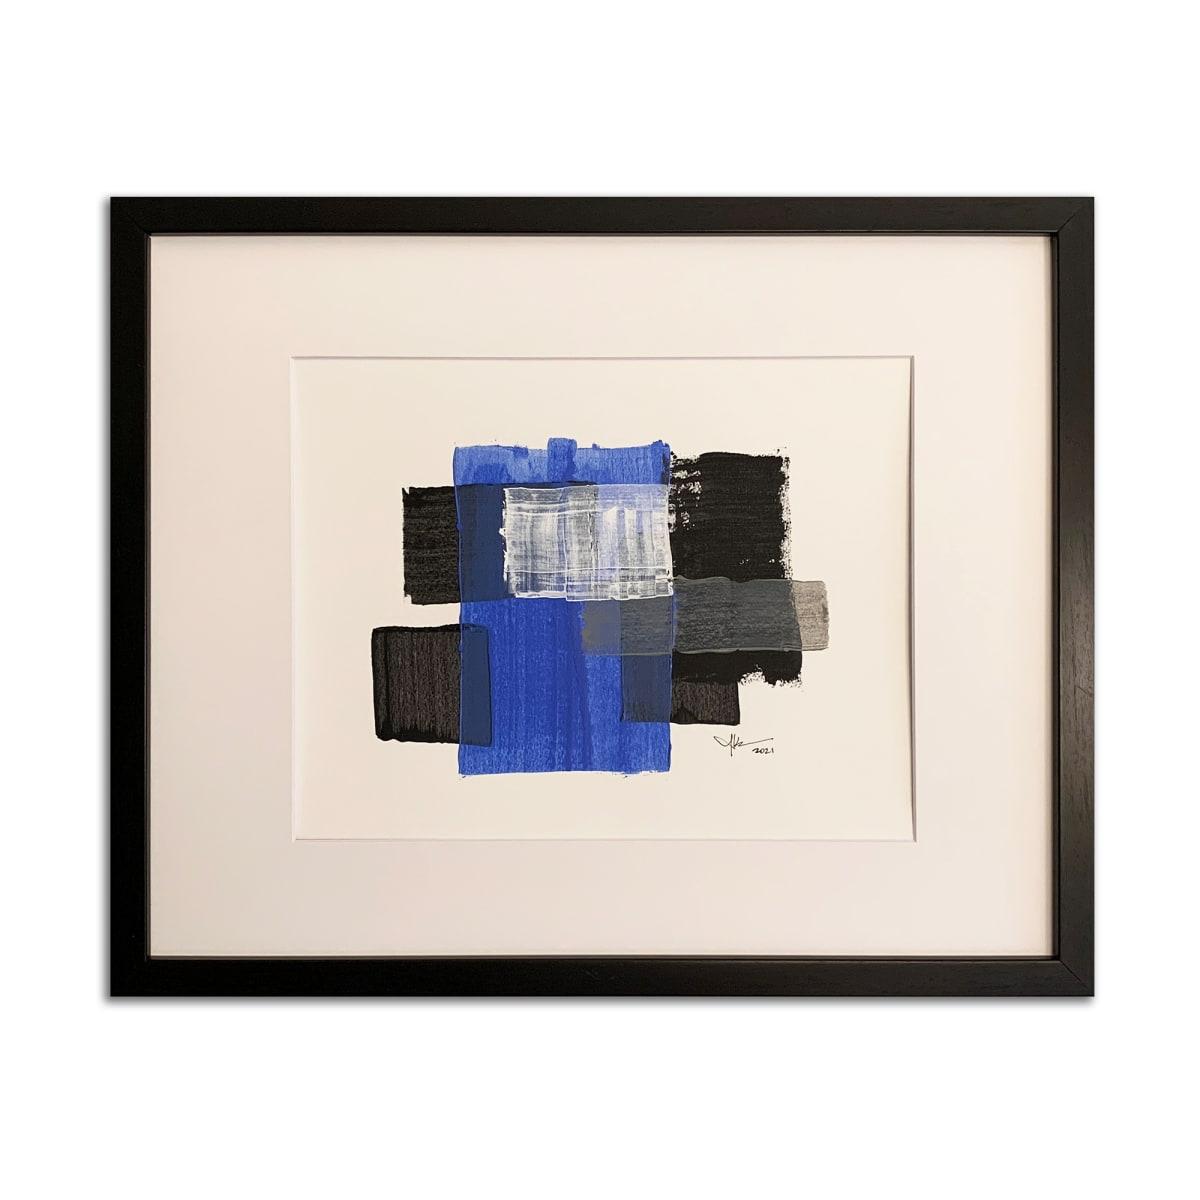 Untitled 60 by J. Kent Martin